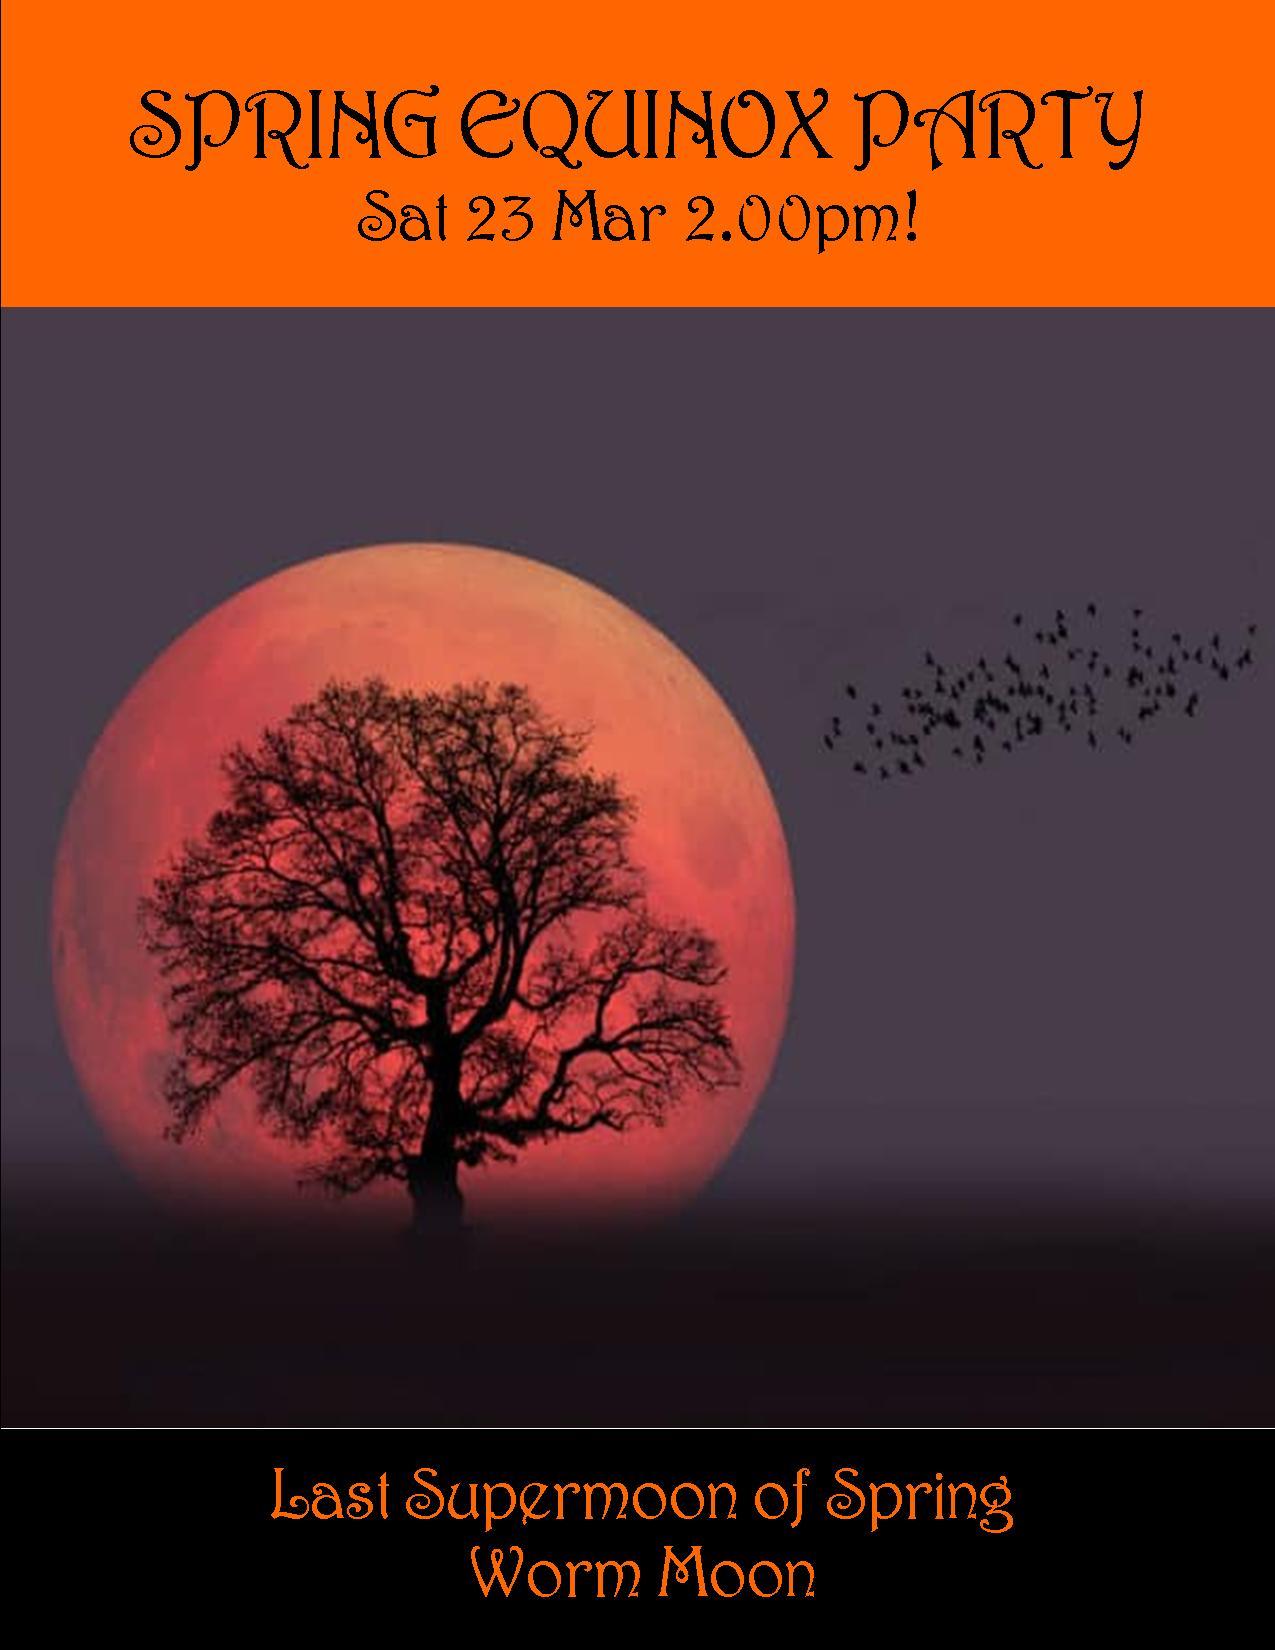 SPRING EQUINOX PARTY SAT 23 MAR 2.00PM